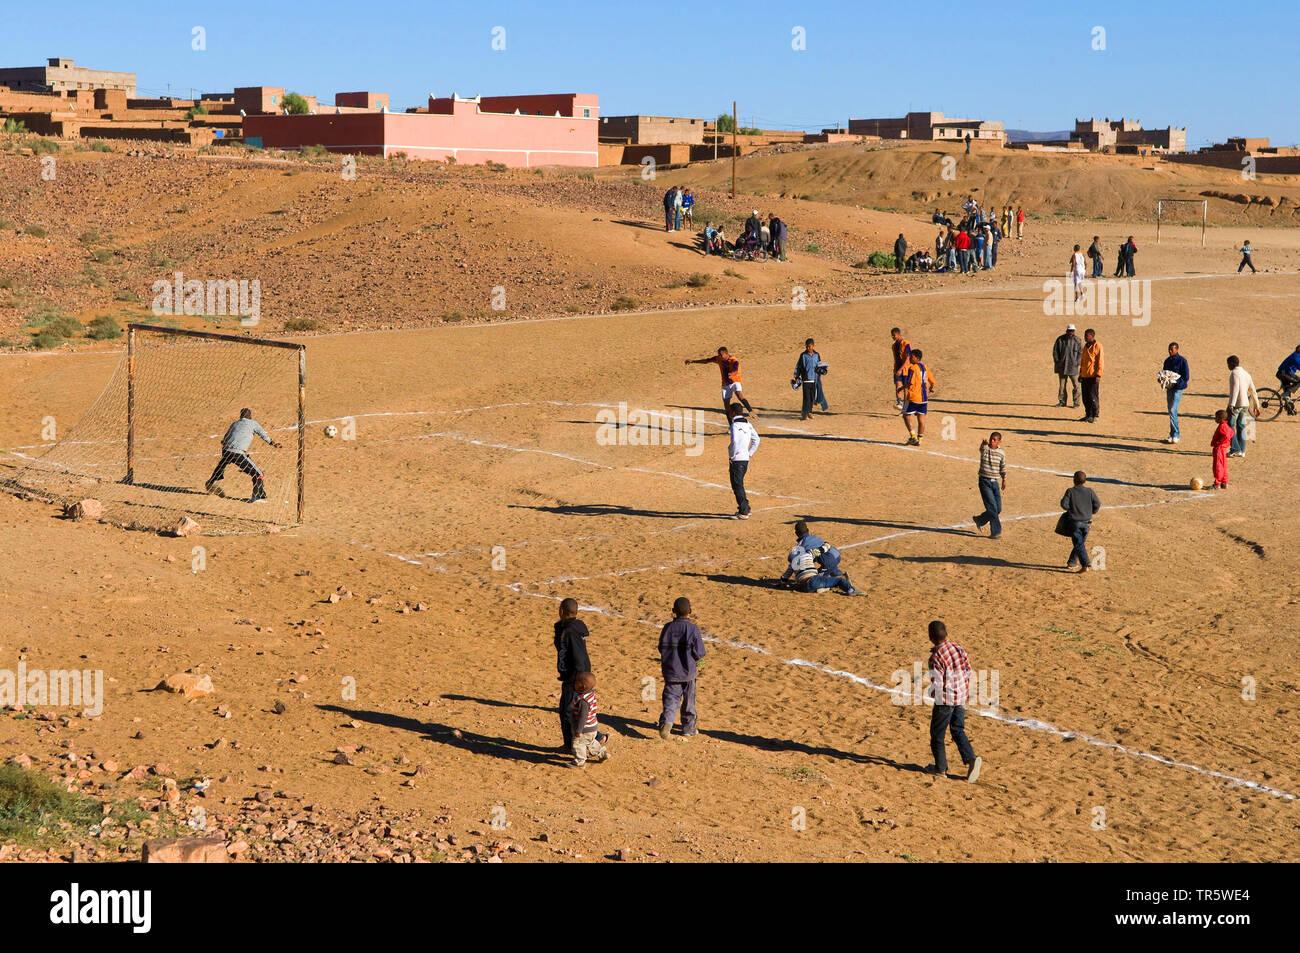 Jugendliche spielen Fussbal im Berberdorf Taourirt, Marokko, Agdz, Taourirt | teenies playing soccer in the Berber village Taourirt, Morocco, Agdz, Ta - Stock Image